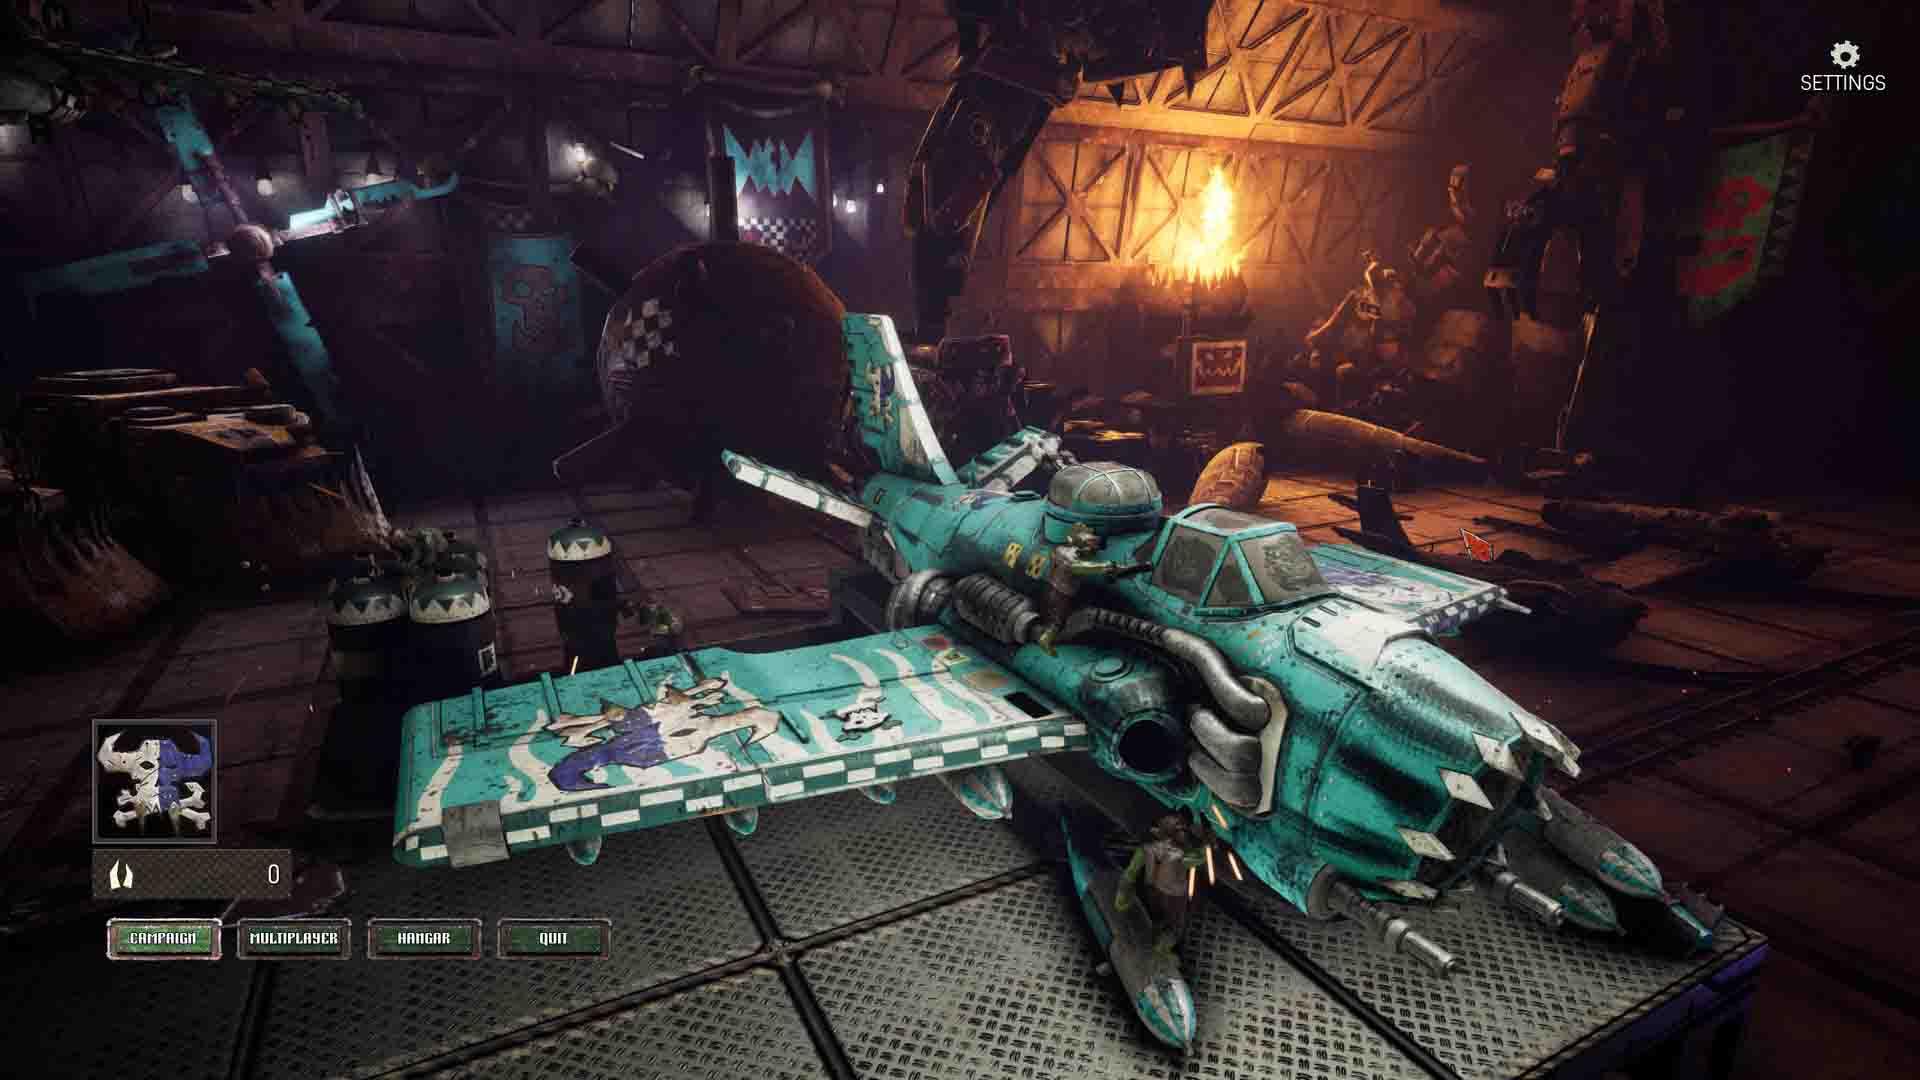 download-Warhammer-40,000-Dakka-Squadron-hadoan-tv-2